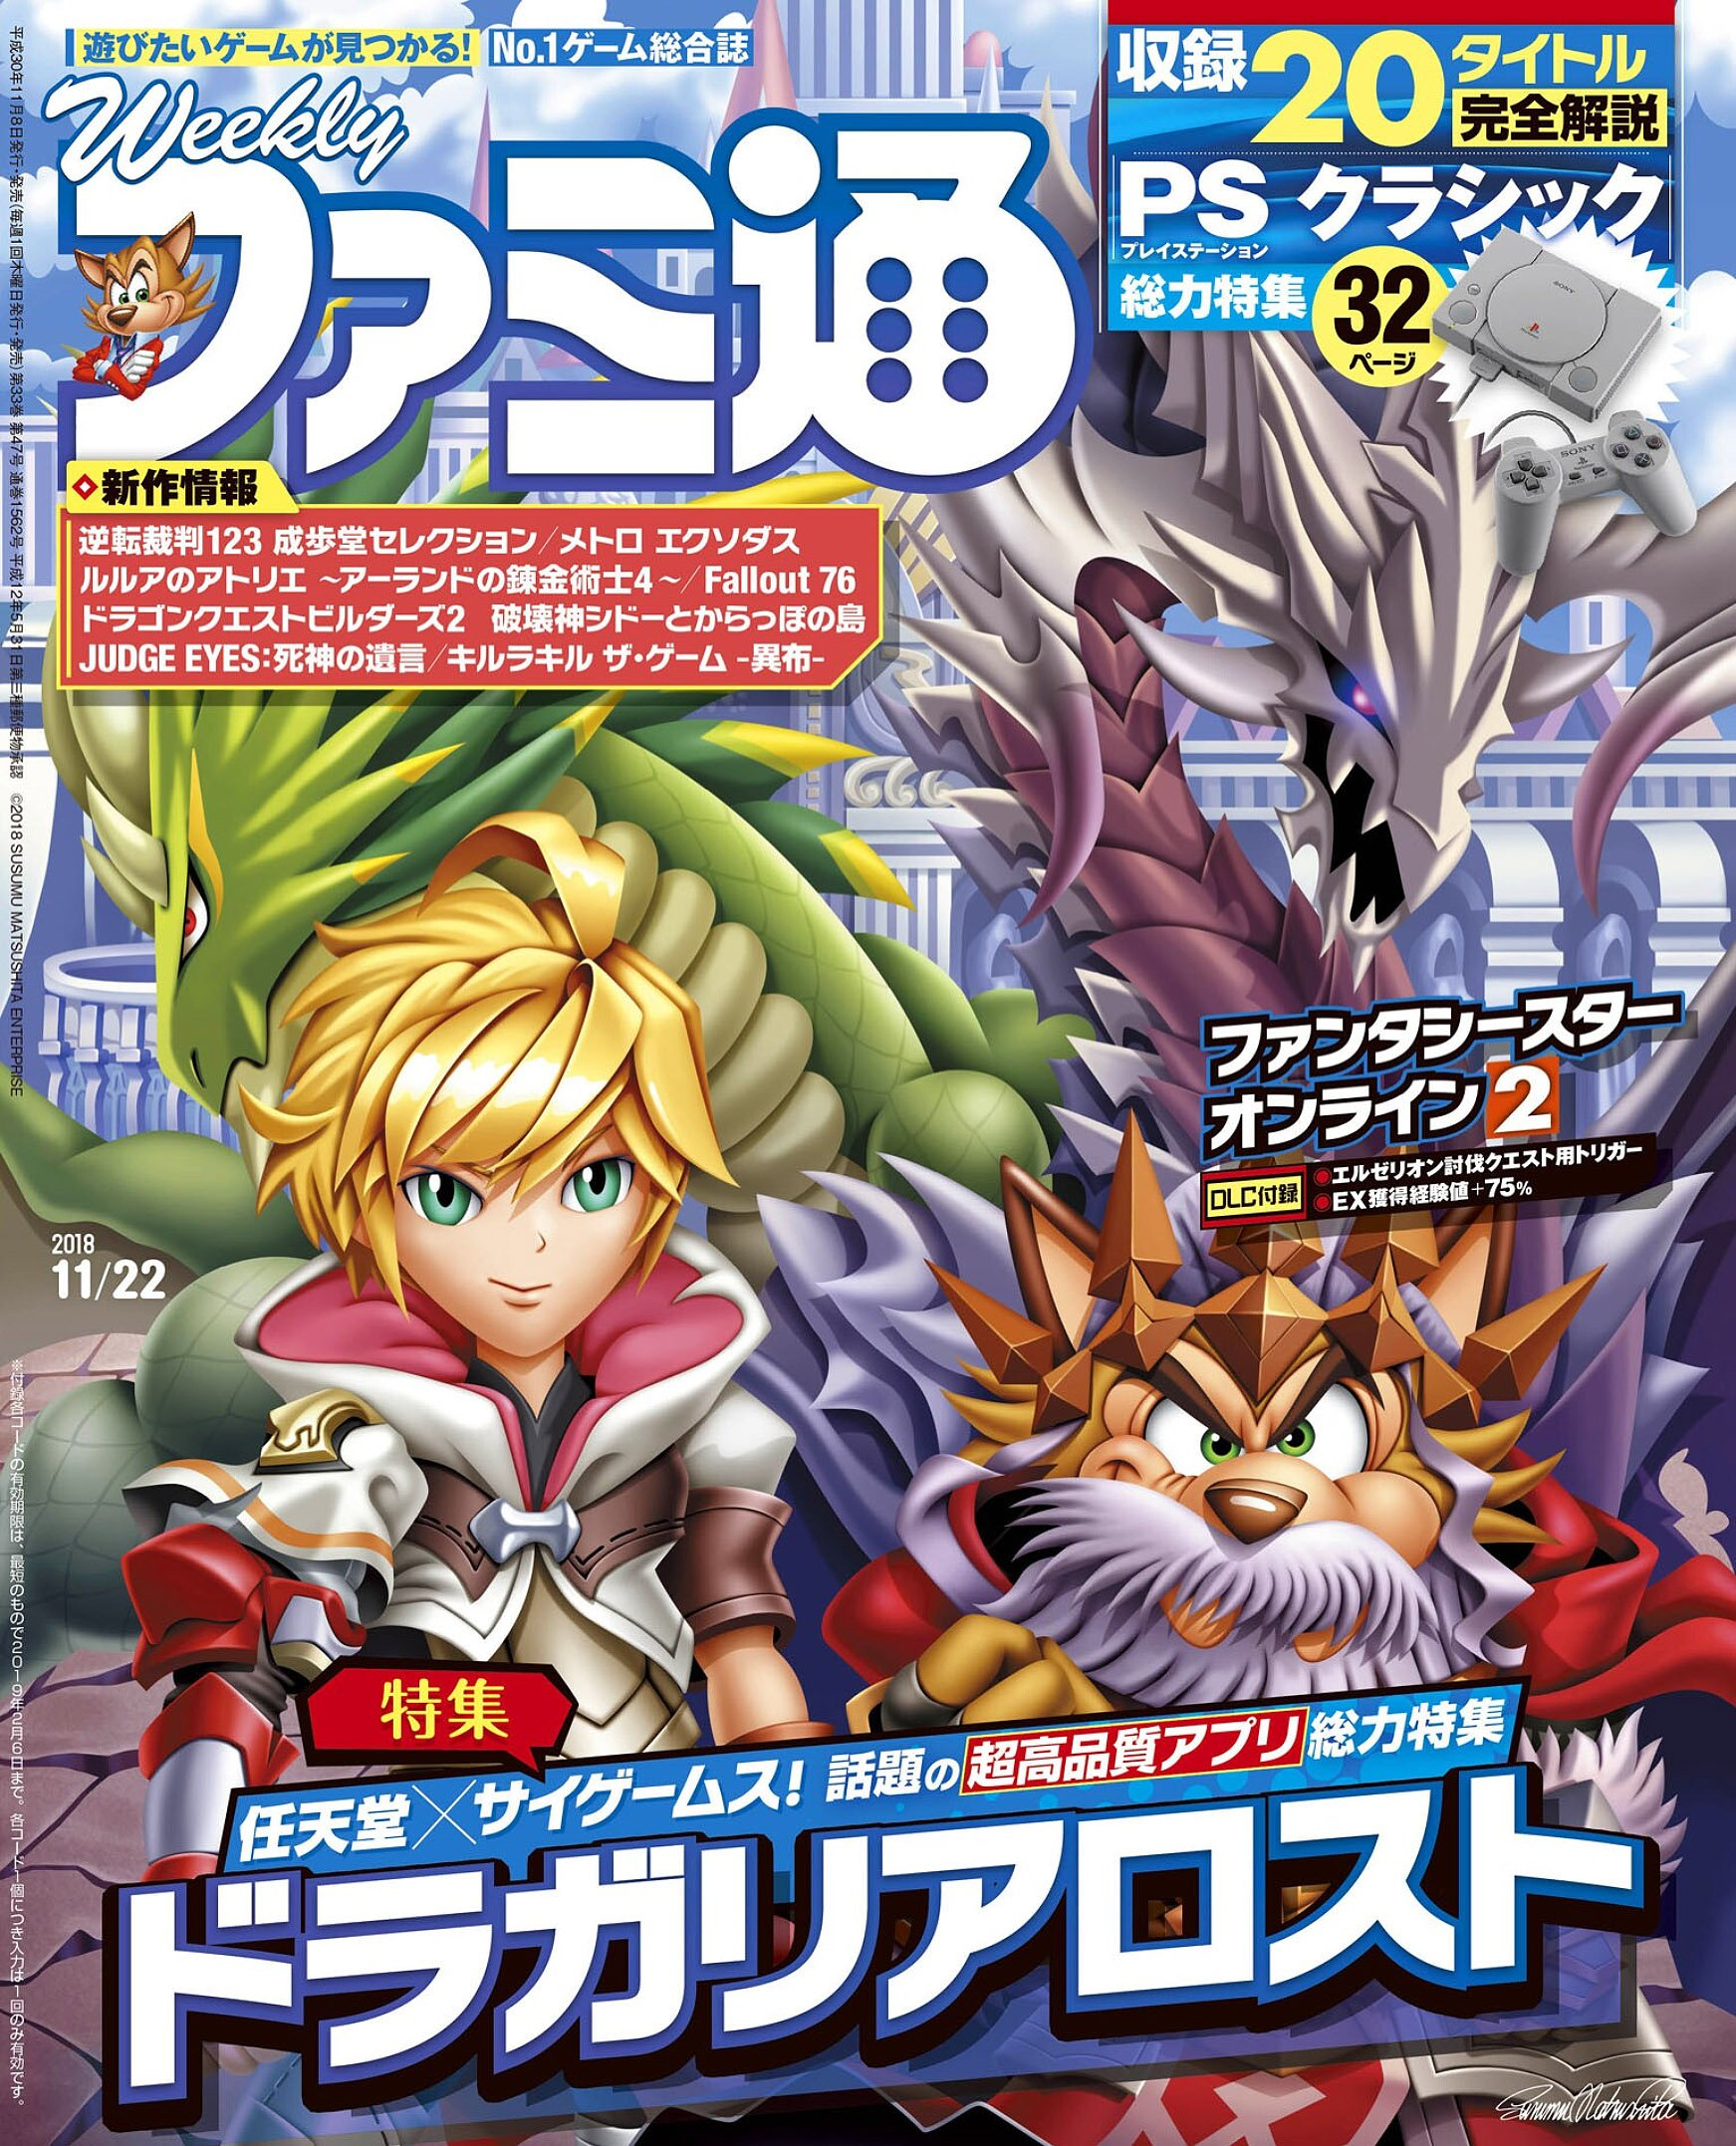 Famitsu 1562 (November 22, 2018)